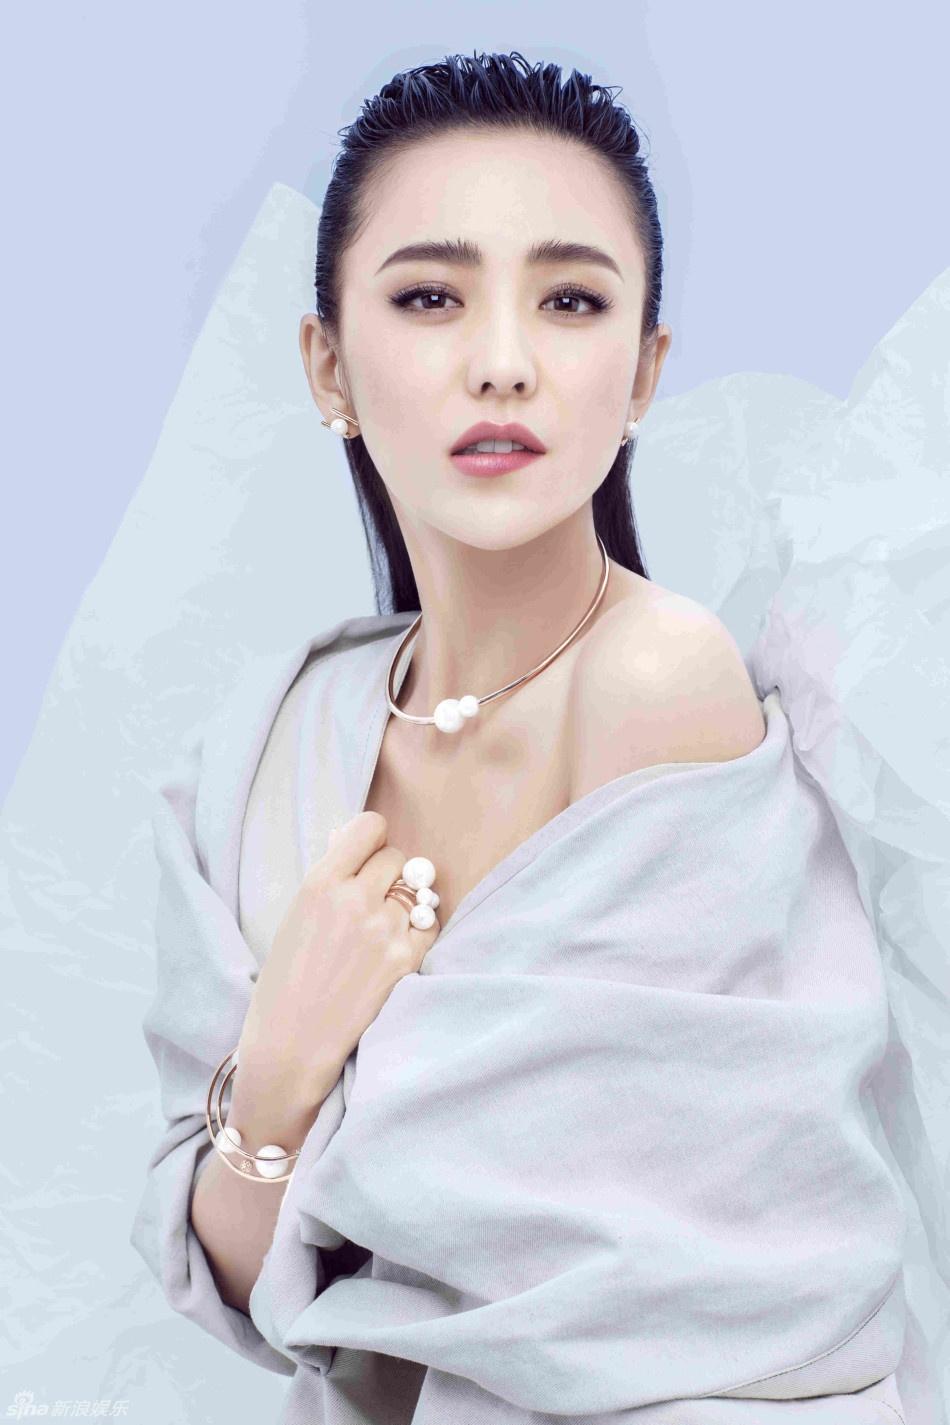 Dong Le A: Tuyet sac Trung Quoc vi sao chap nhan chong lien tuc co bo? hinh anh 2